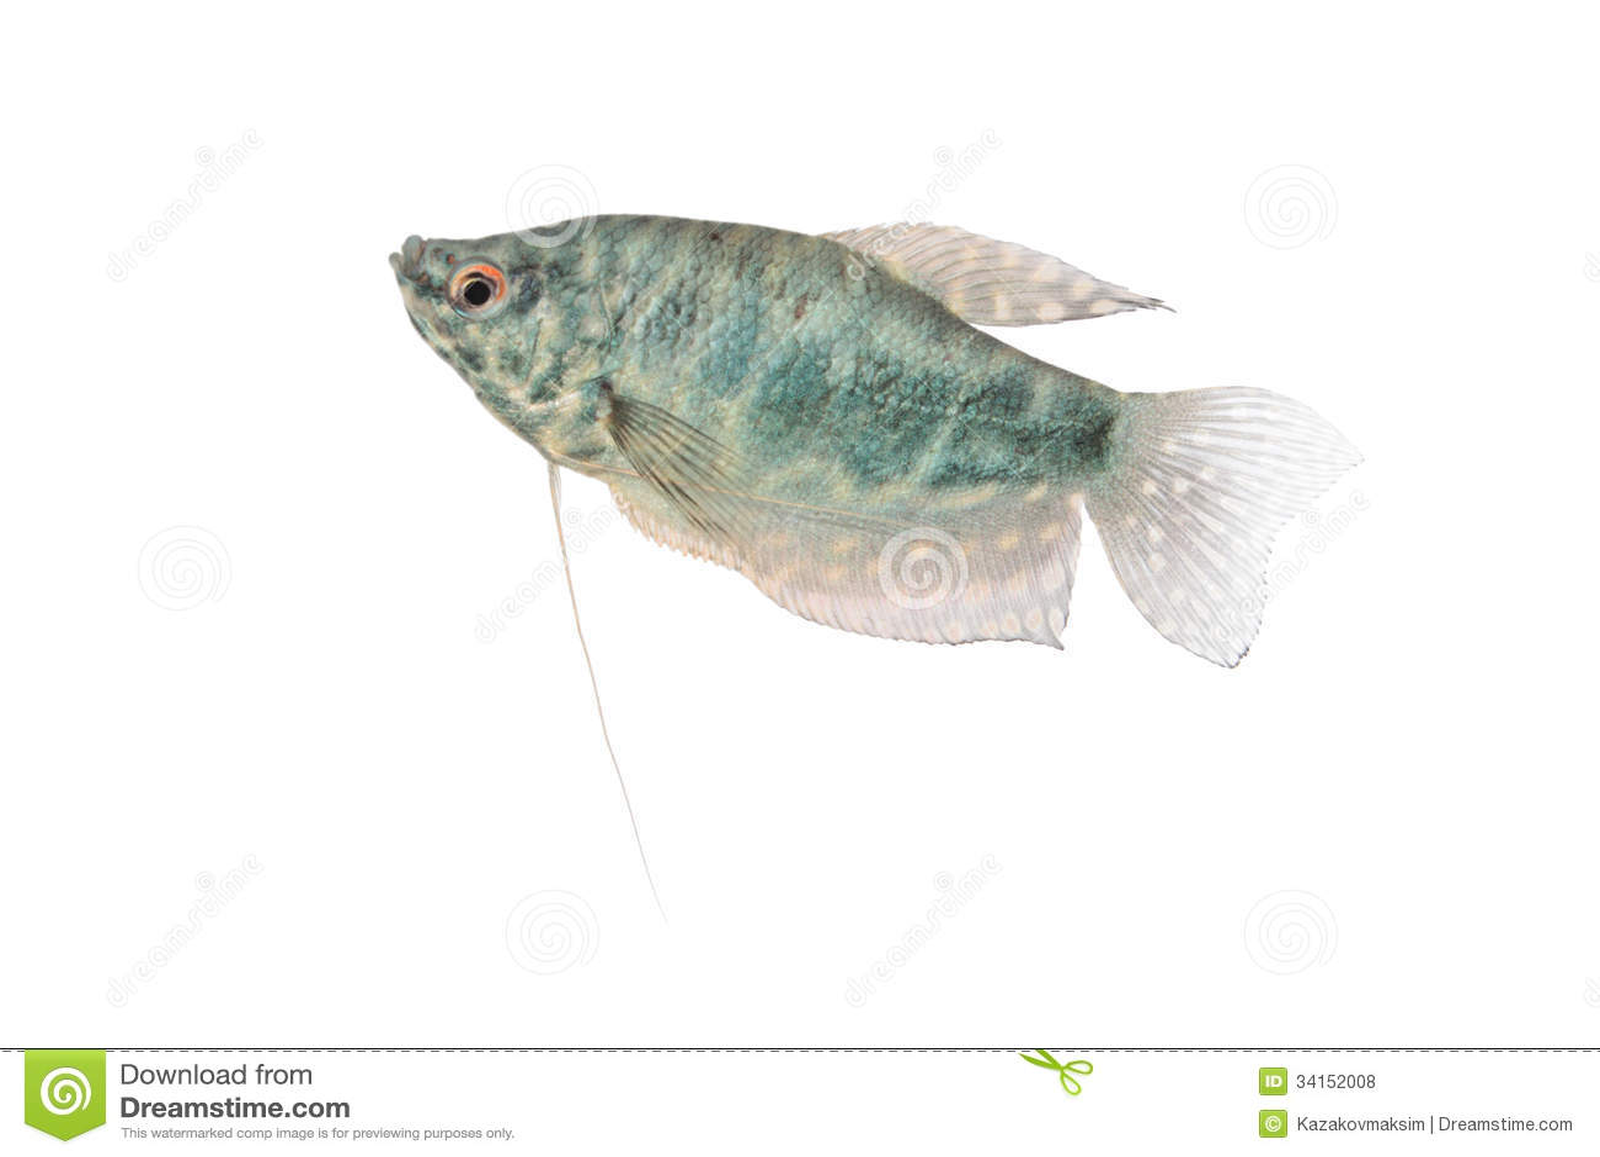 Blue Gourami Aquarium Fish Isolated On White Stock Photo